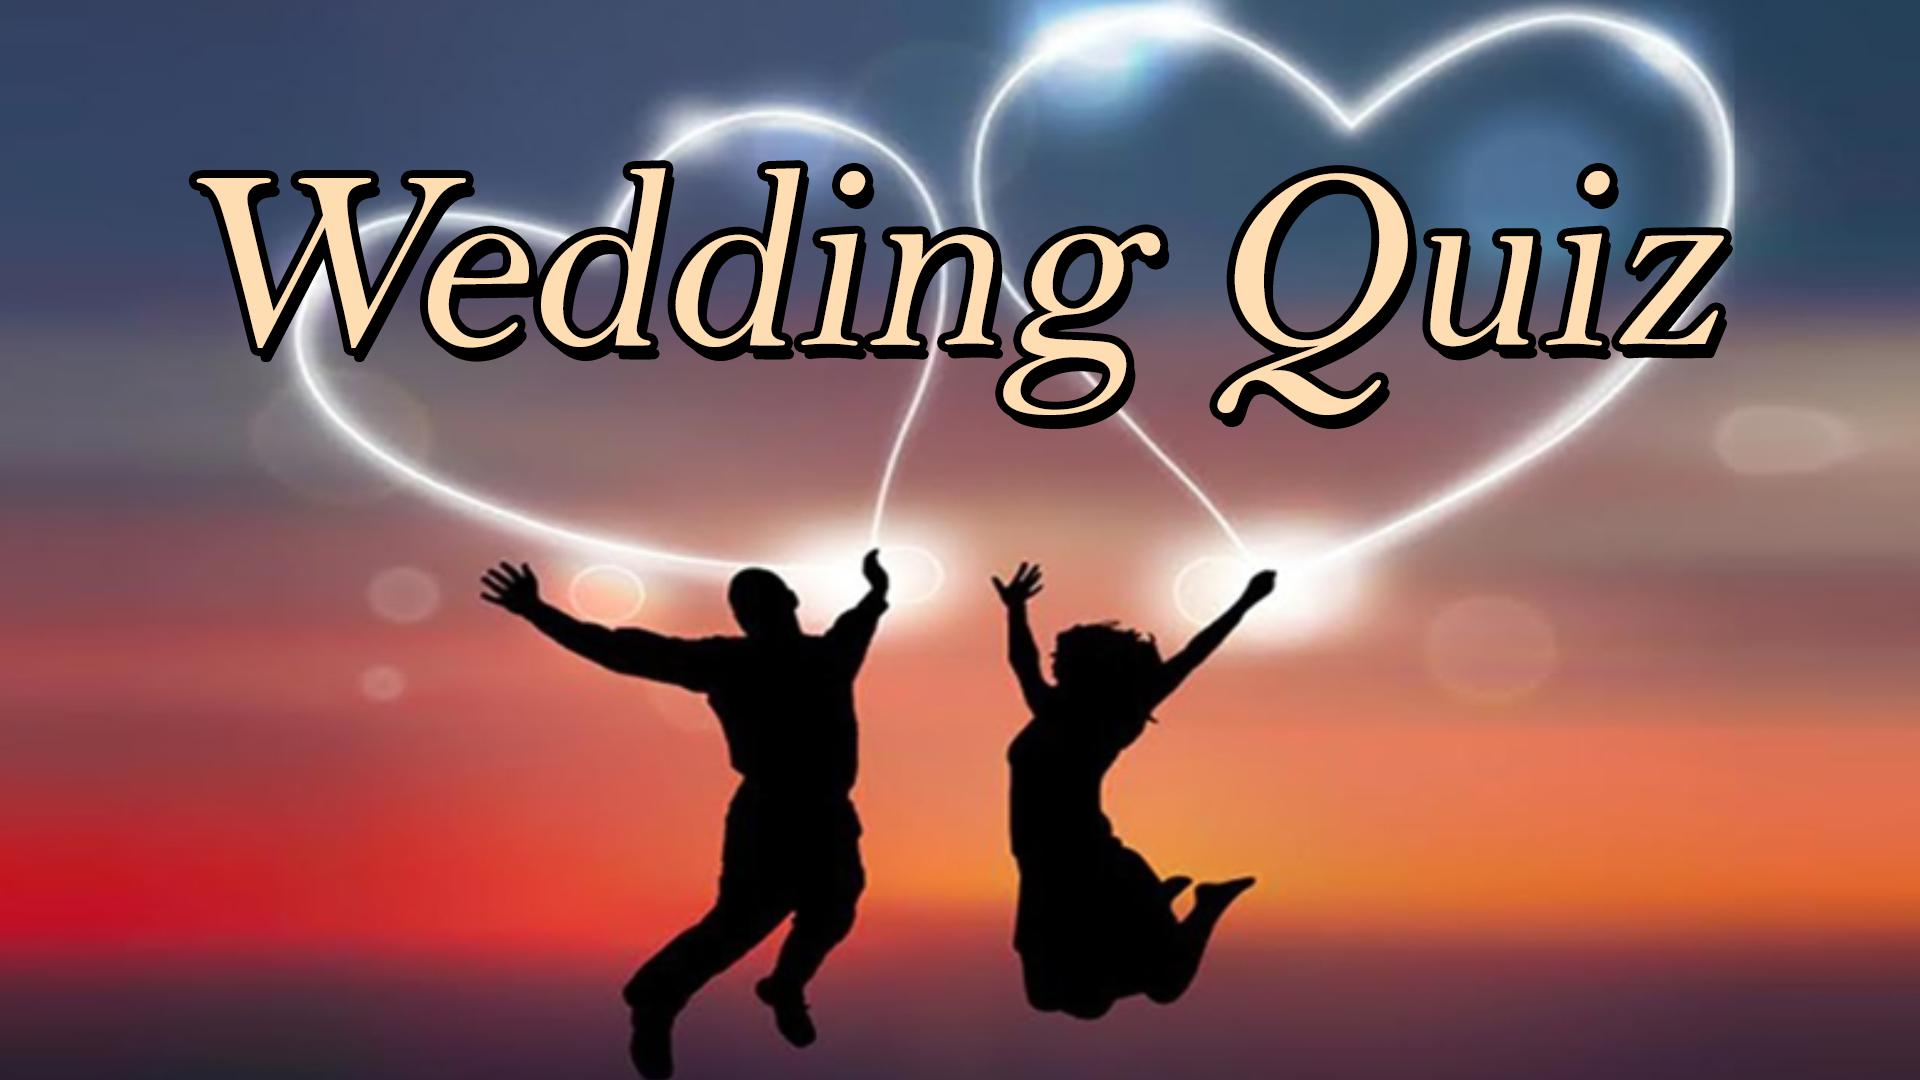 Wedding quiz 1080